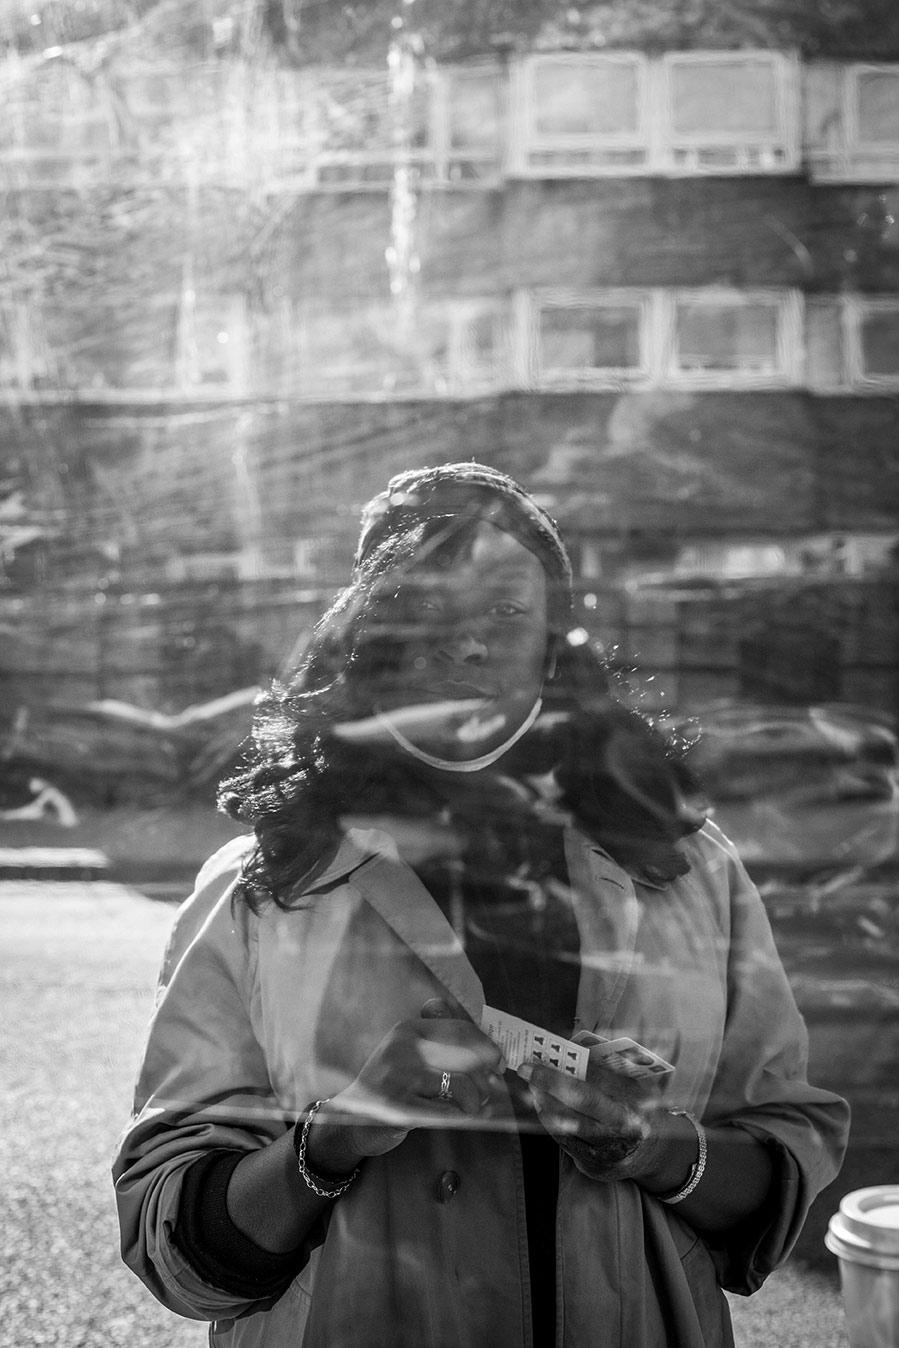 Black & white portrait of coffee shop customer through a window